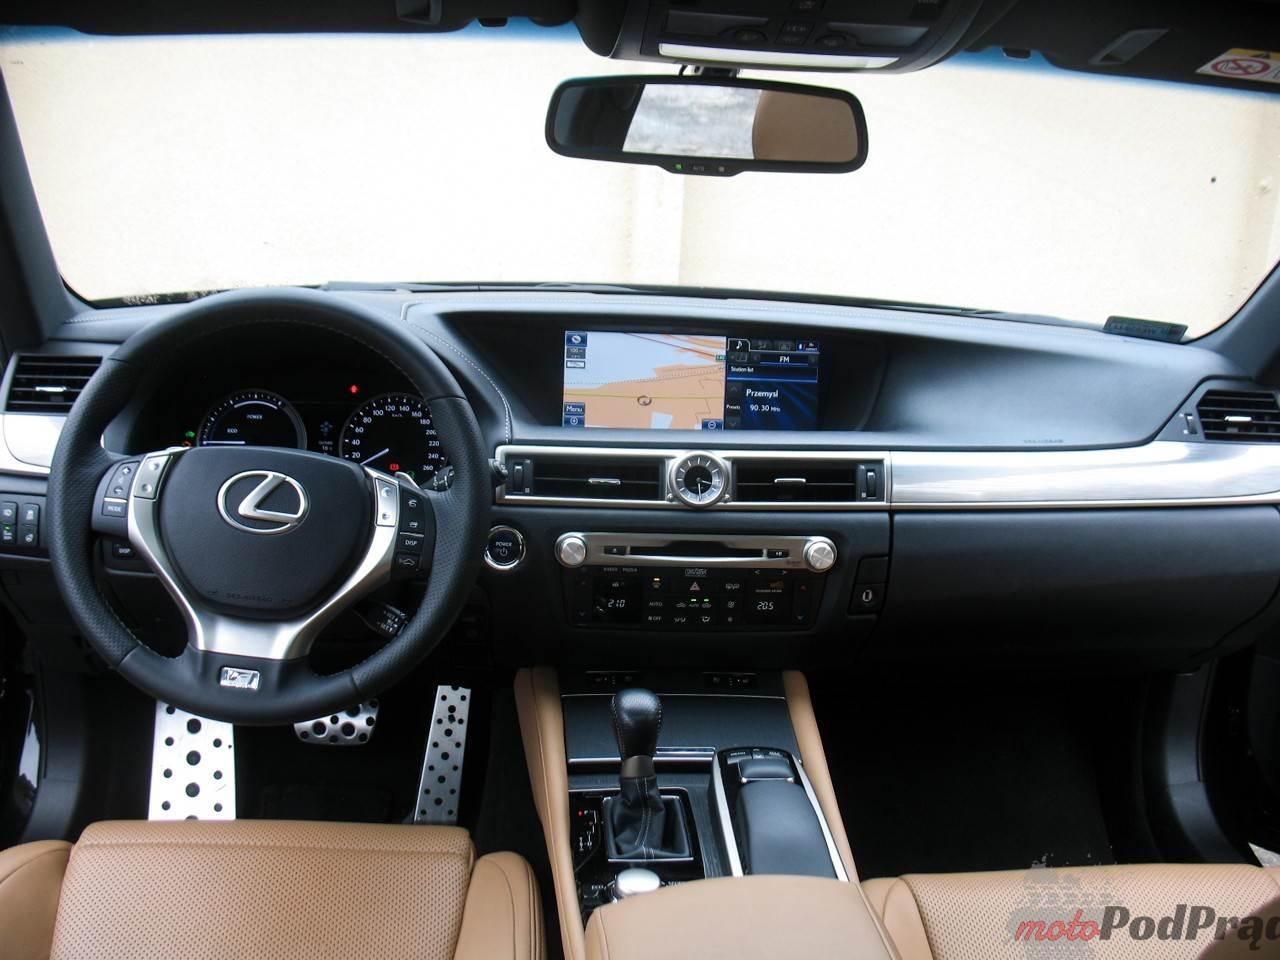 Lexus GS 300 H 16 Test: Lexus GS 300 h